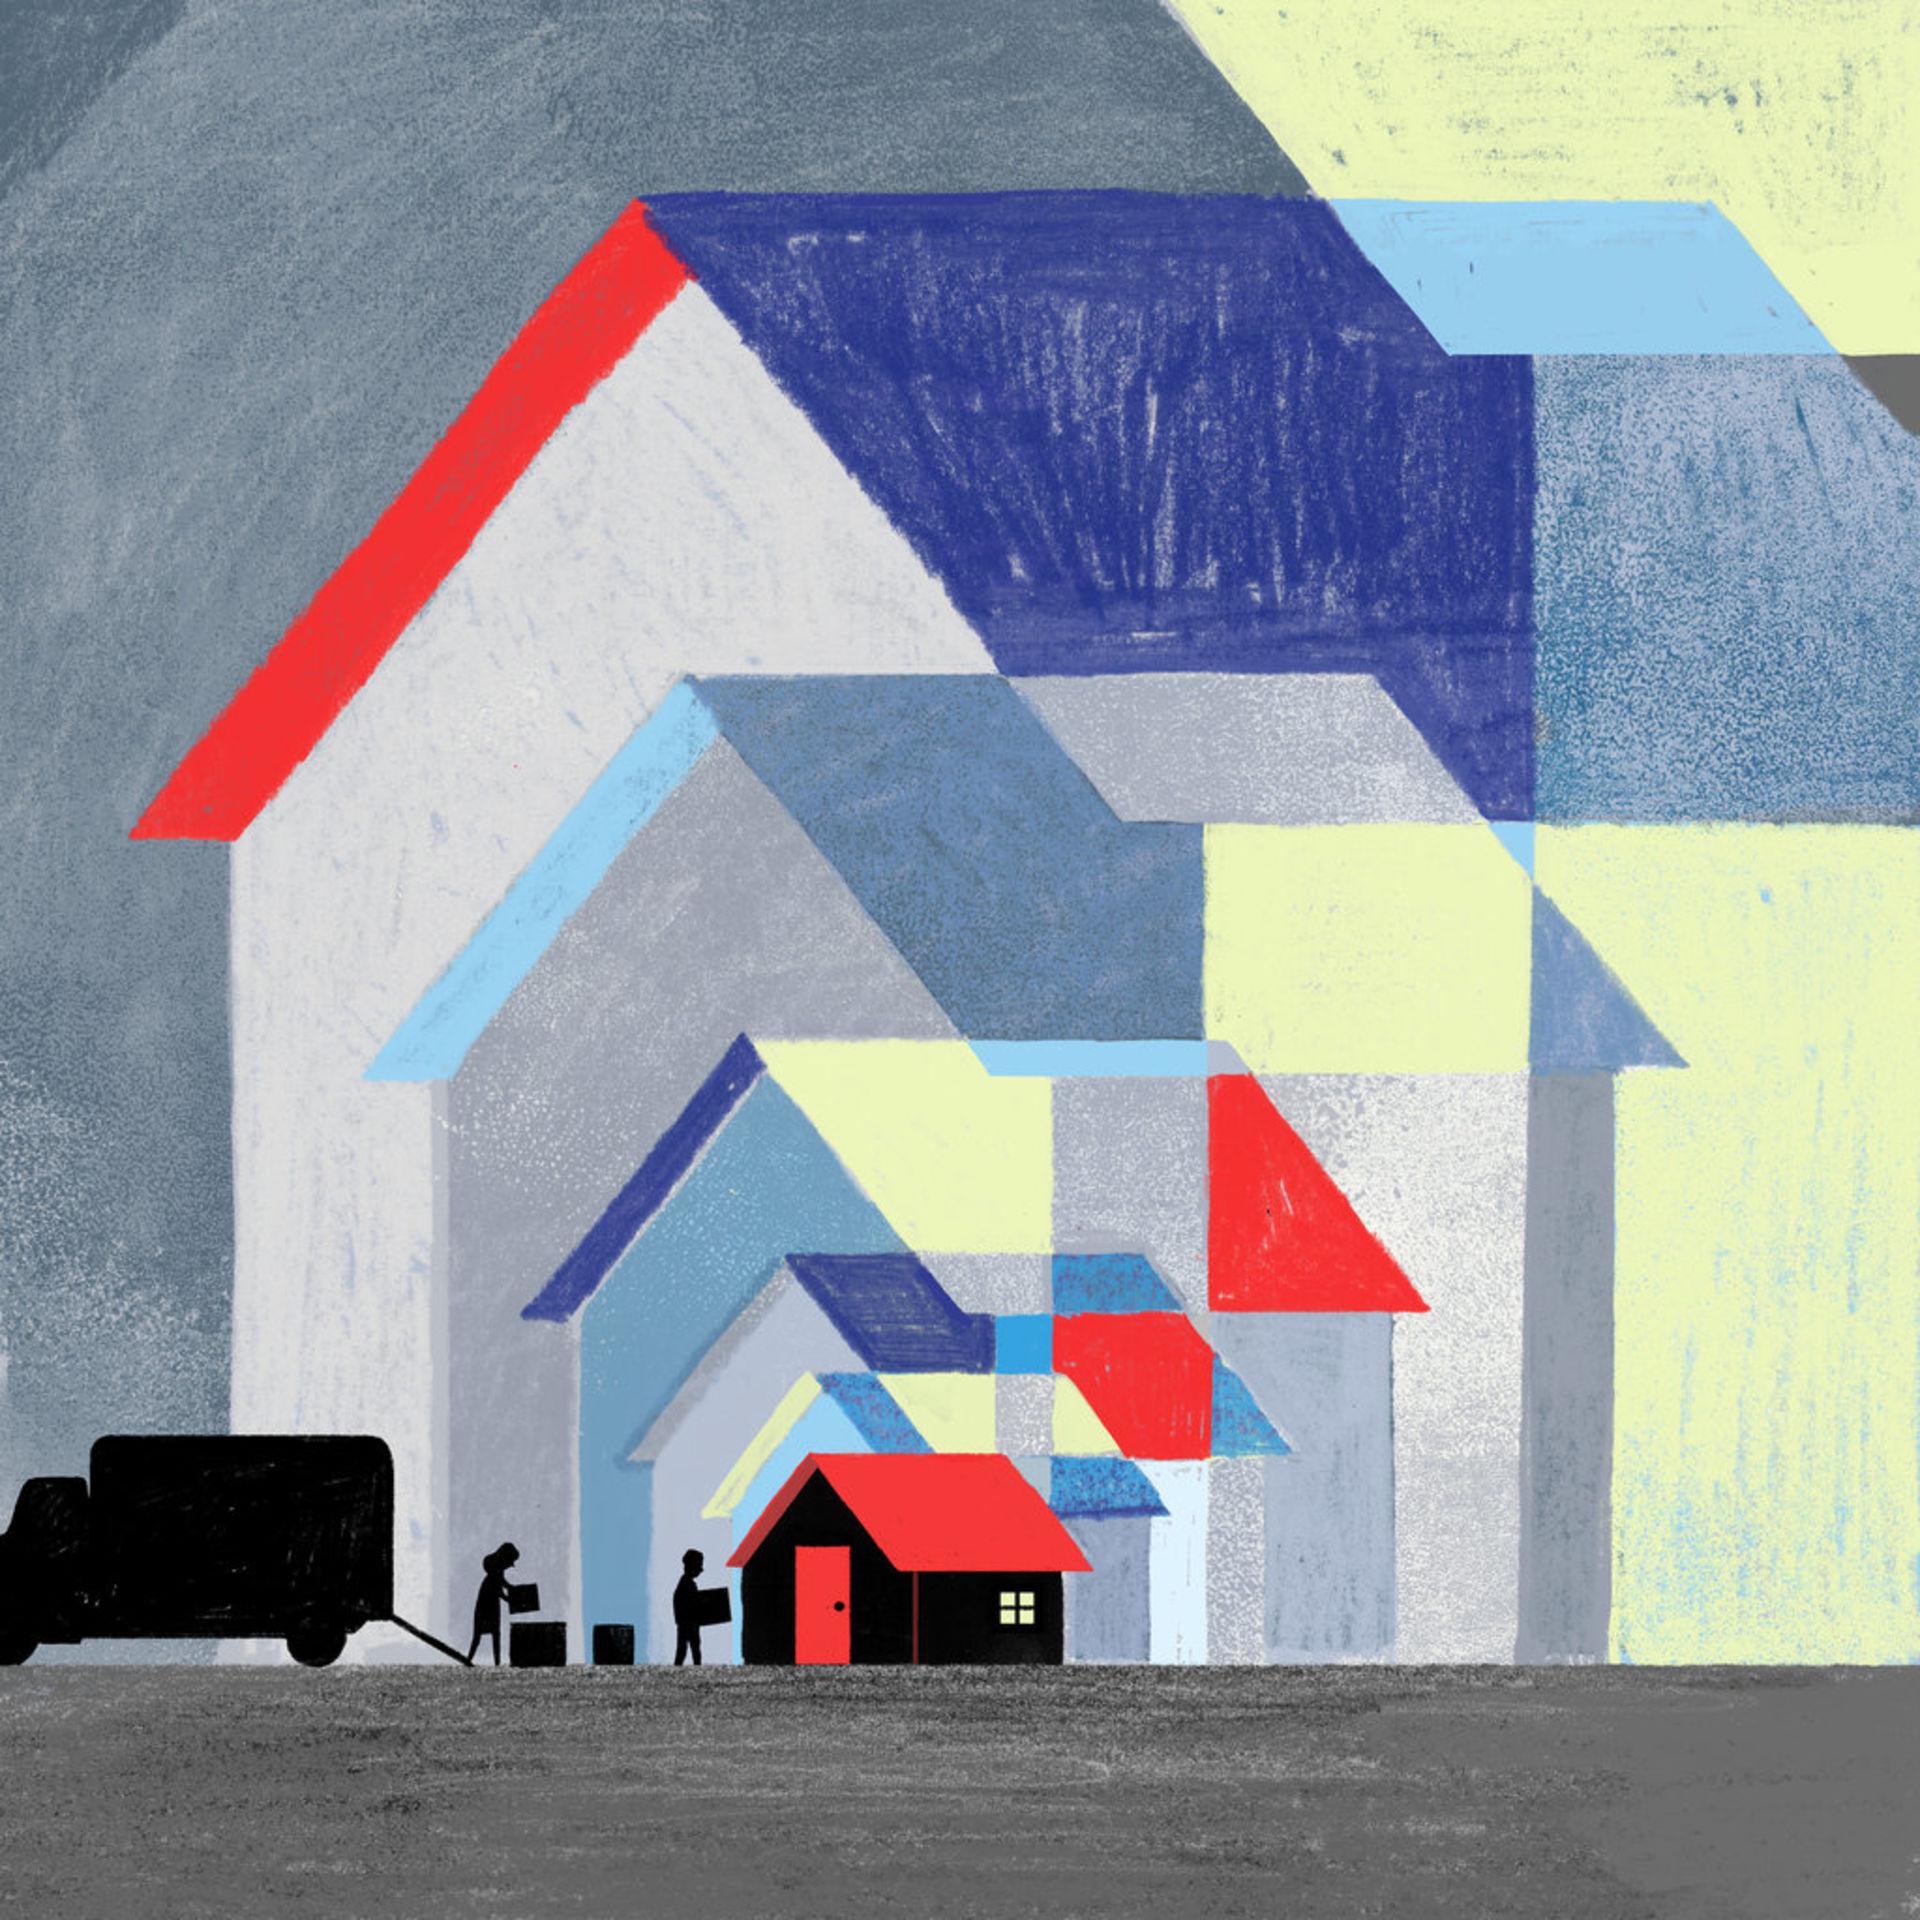 Economist: Austin housing market still on record pace